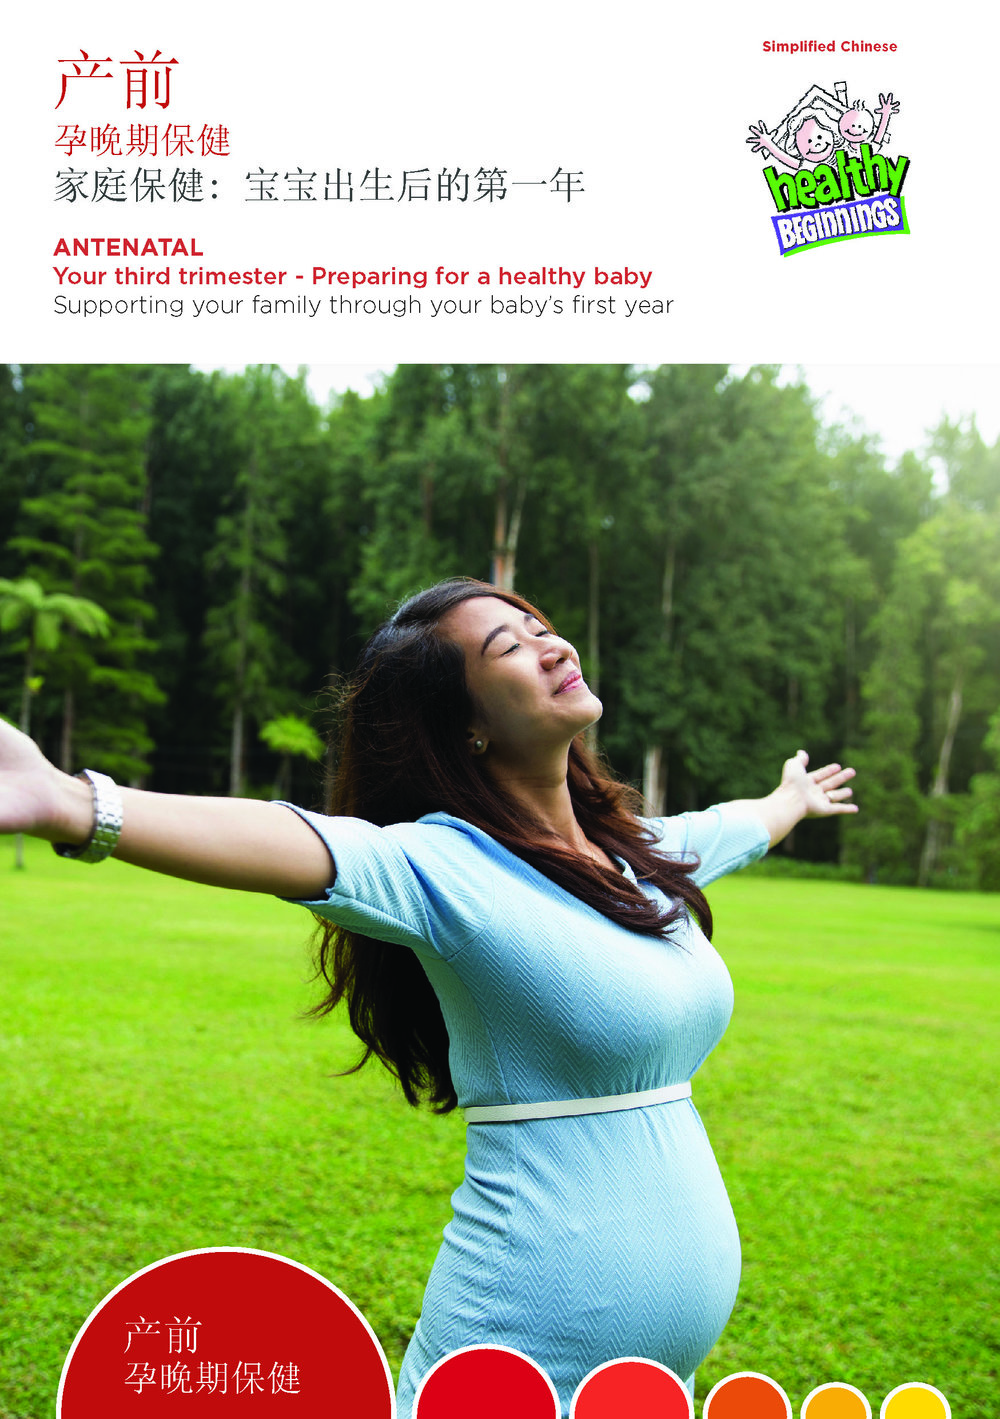 BOOKLET 1 ANTENATAL CHINESE_v4_SINGLES.jpg